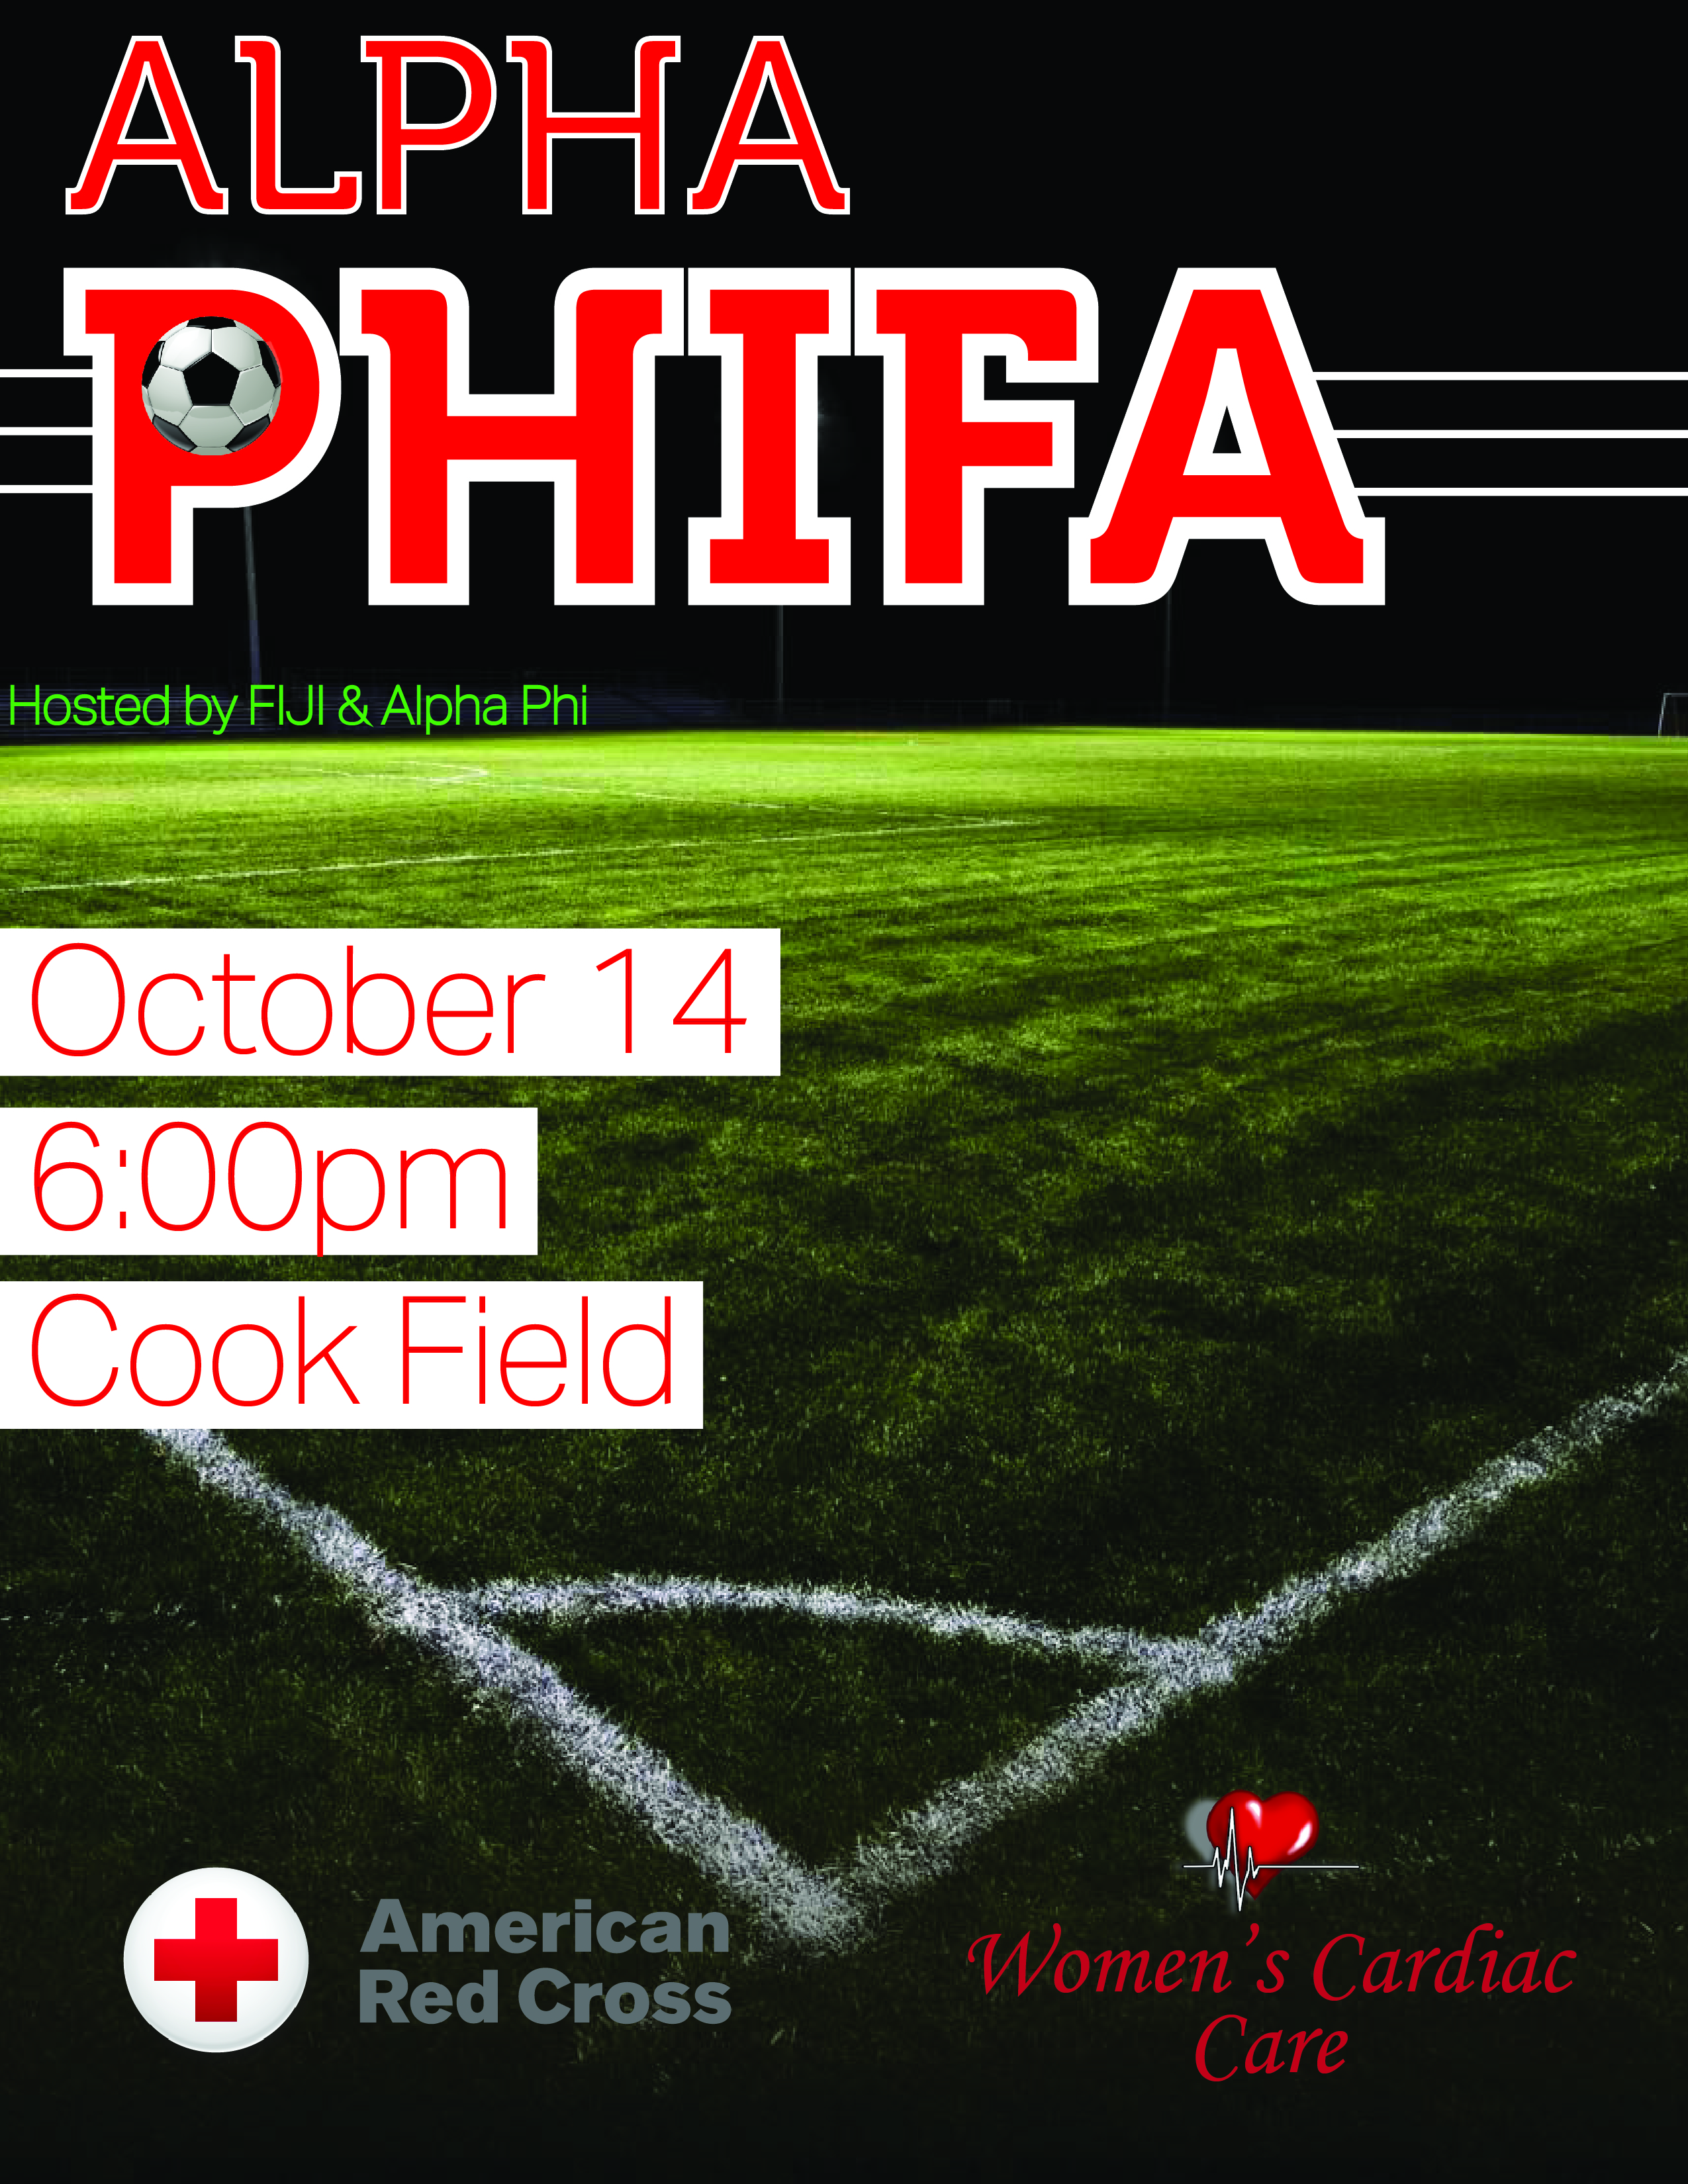 Alpha Phifa_Flyer